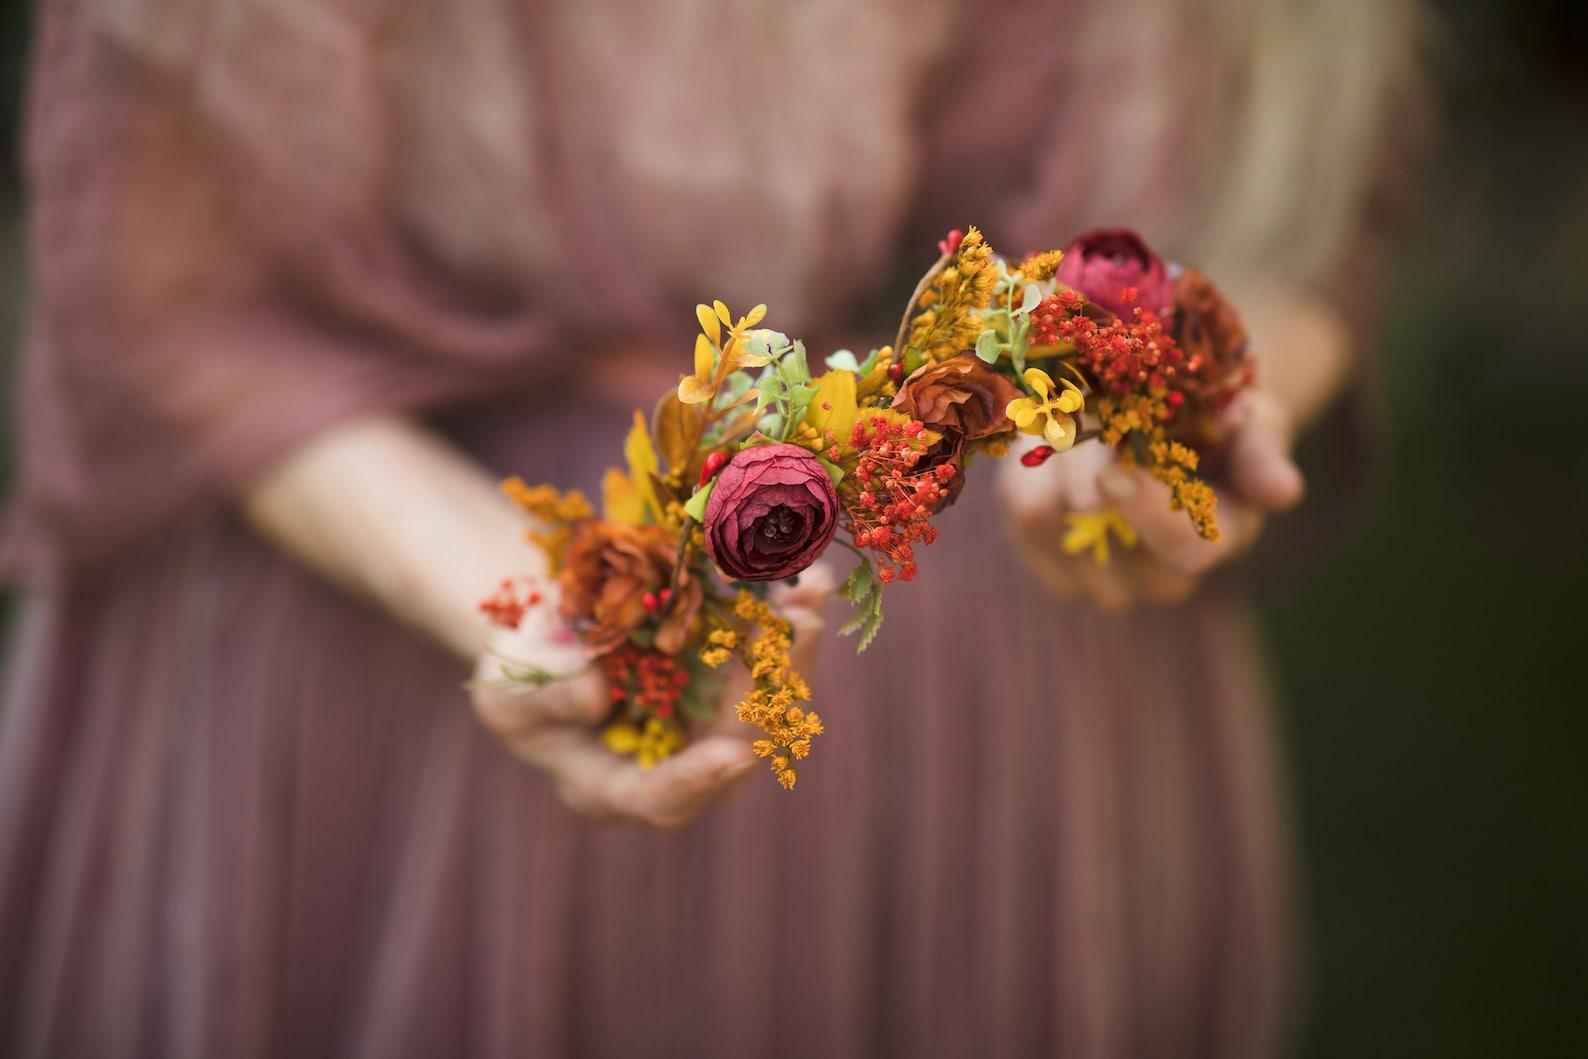 Autumn/Fall flower half-crown